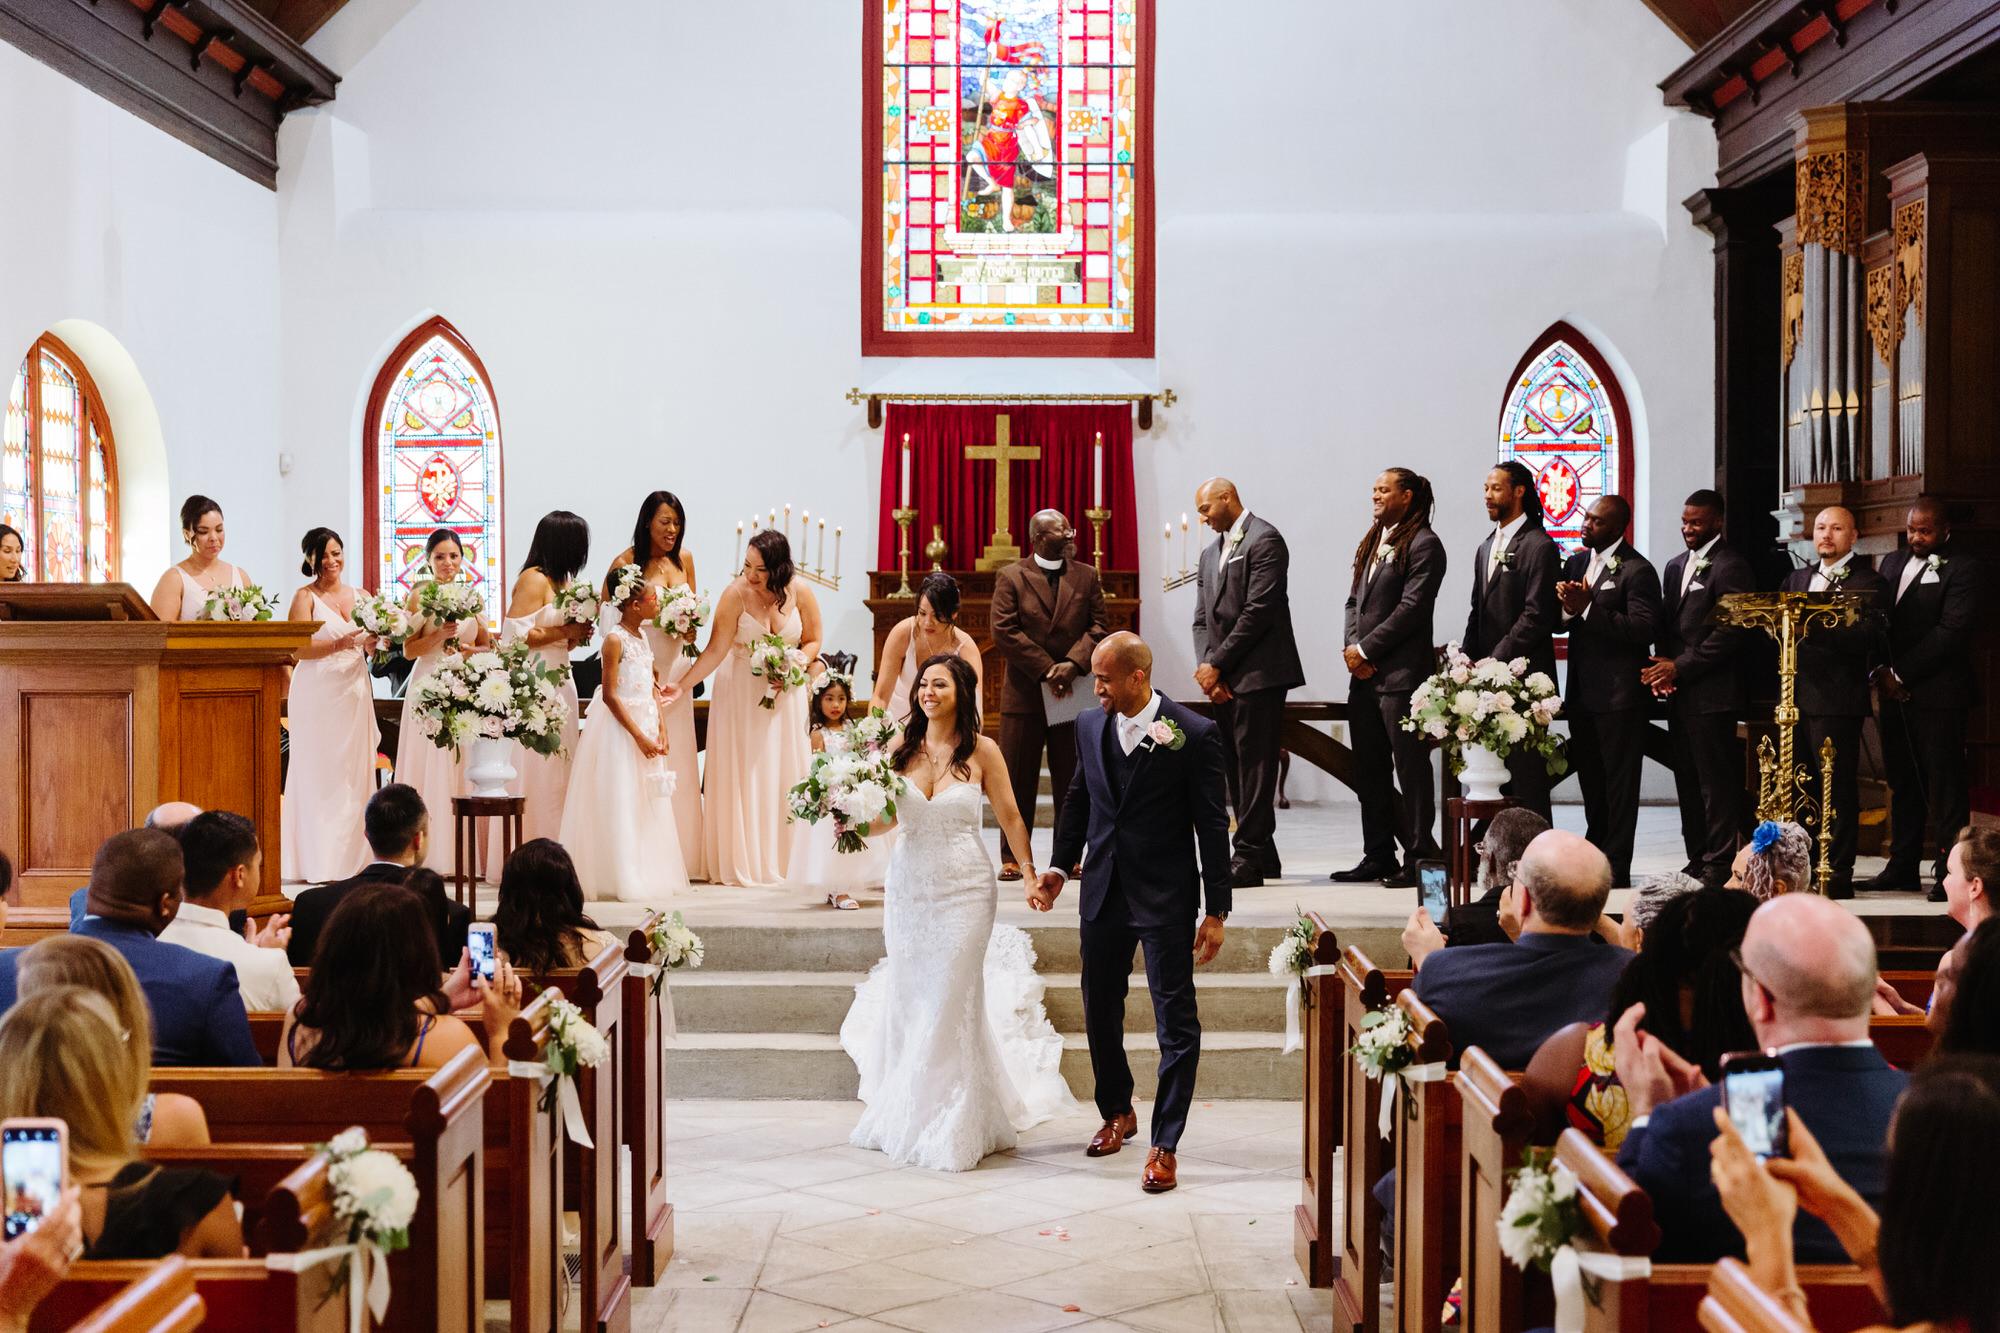 st-lukes-chapel-cannon-green-charleston-wedding-933.JPG